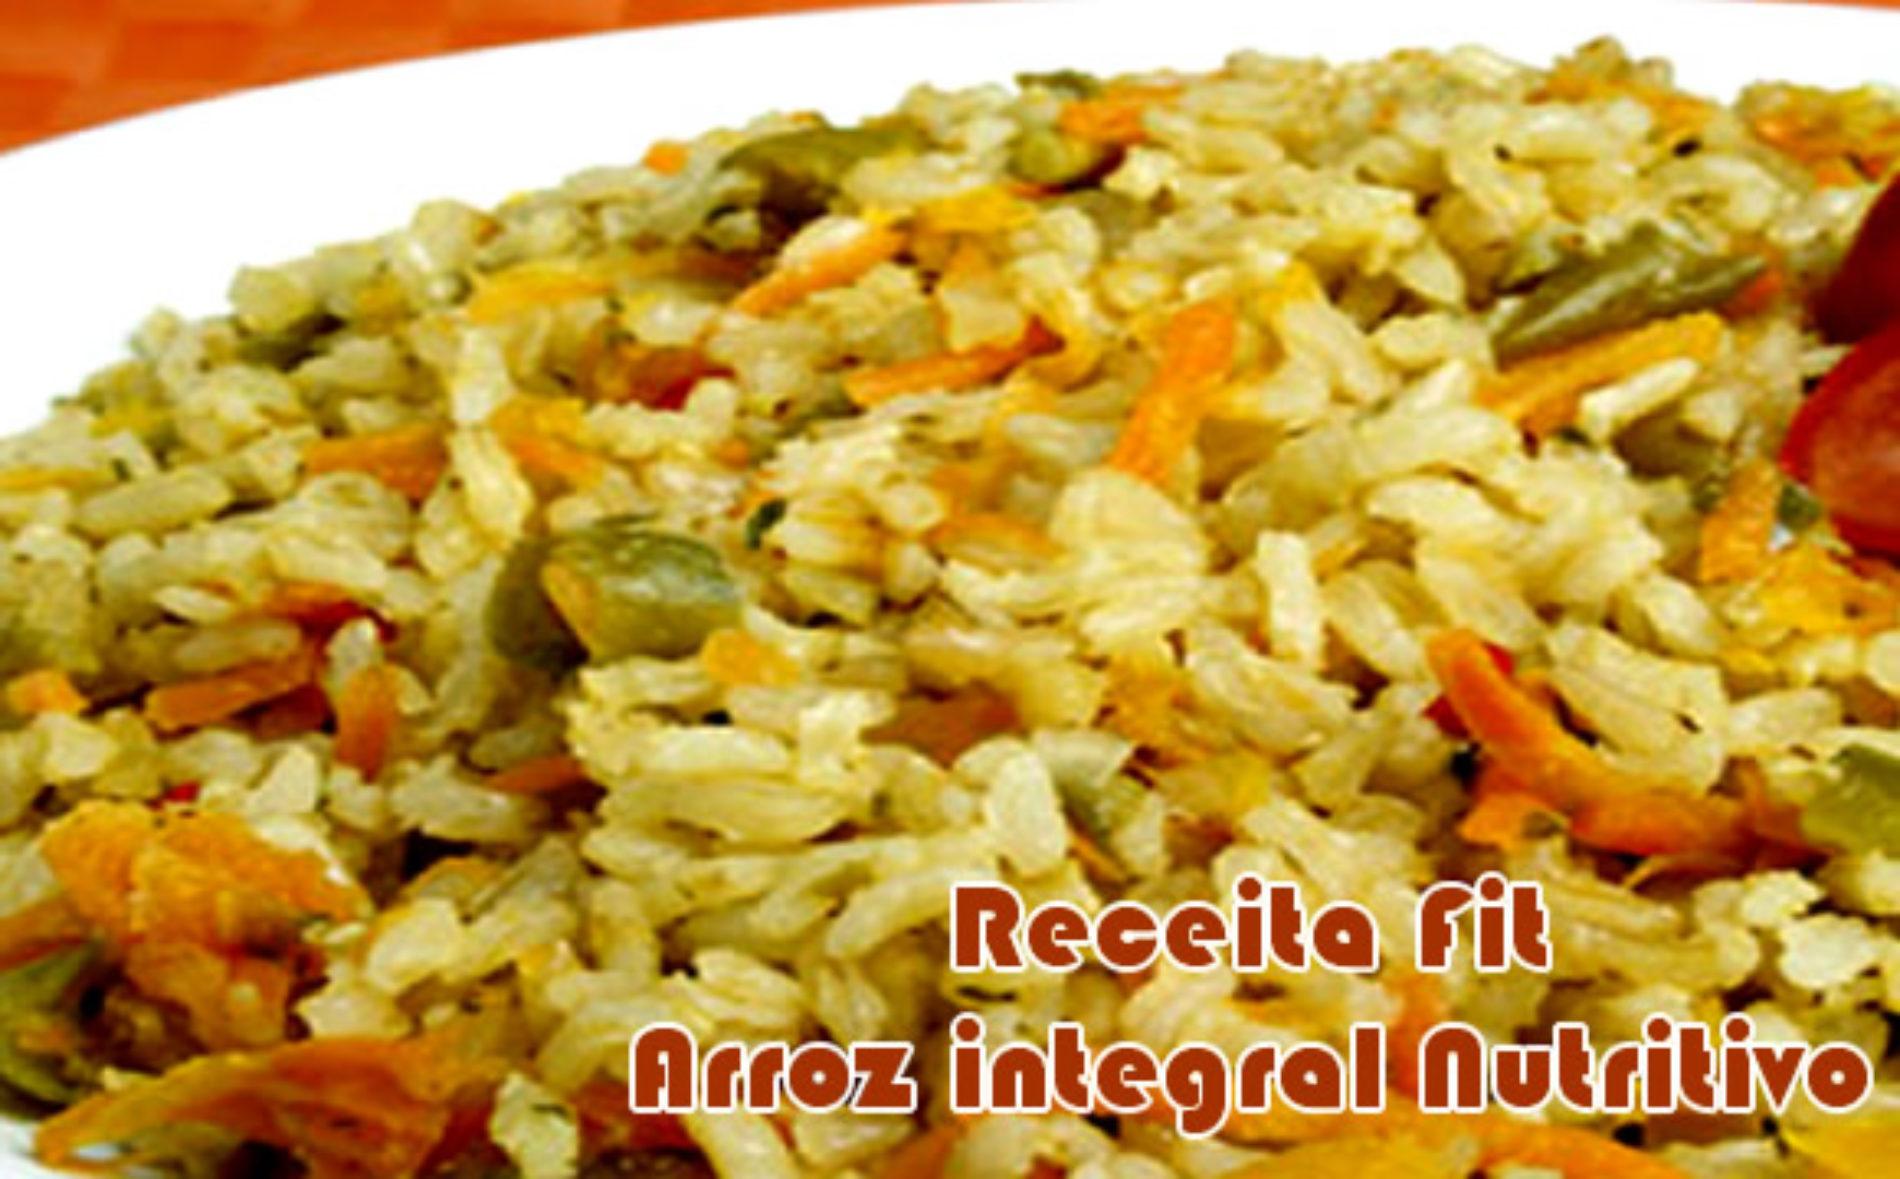 Arroz integral nutritivo e delicioso – Receitas fit